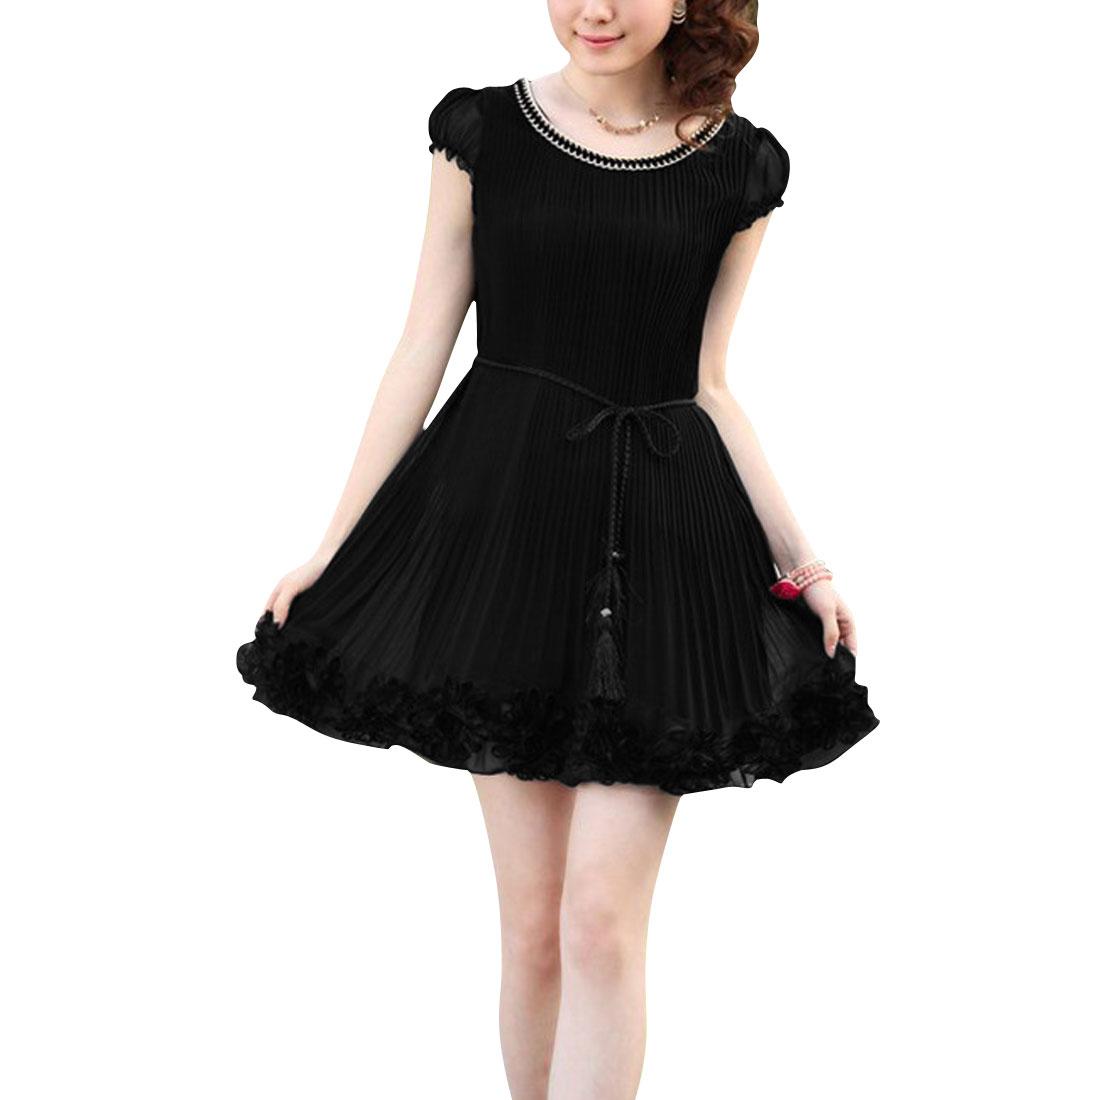 Elegant Ladies Self Tie String Stretchy Puff Sleeve Modern Dress Black XS